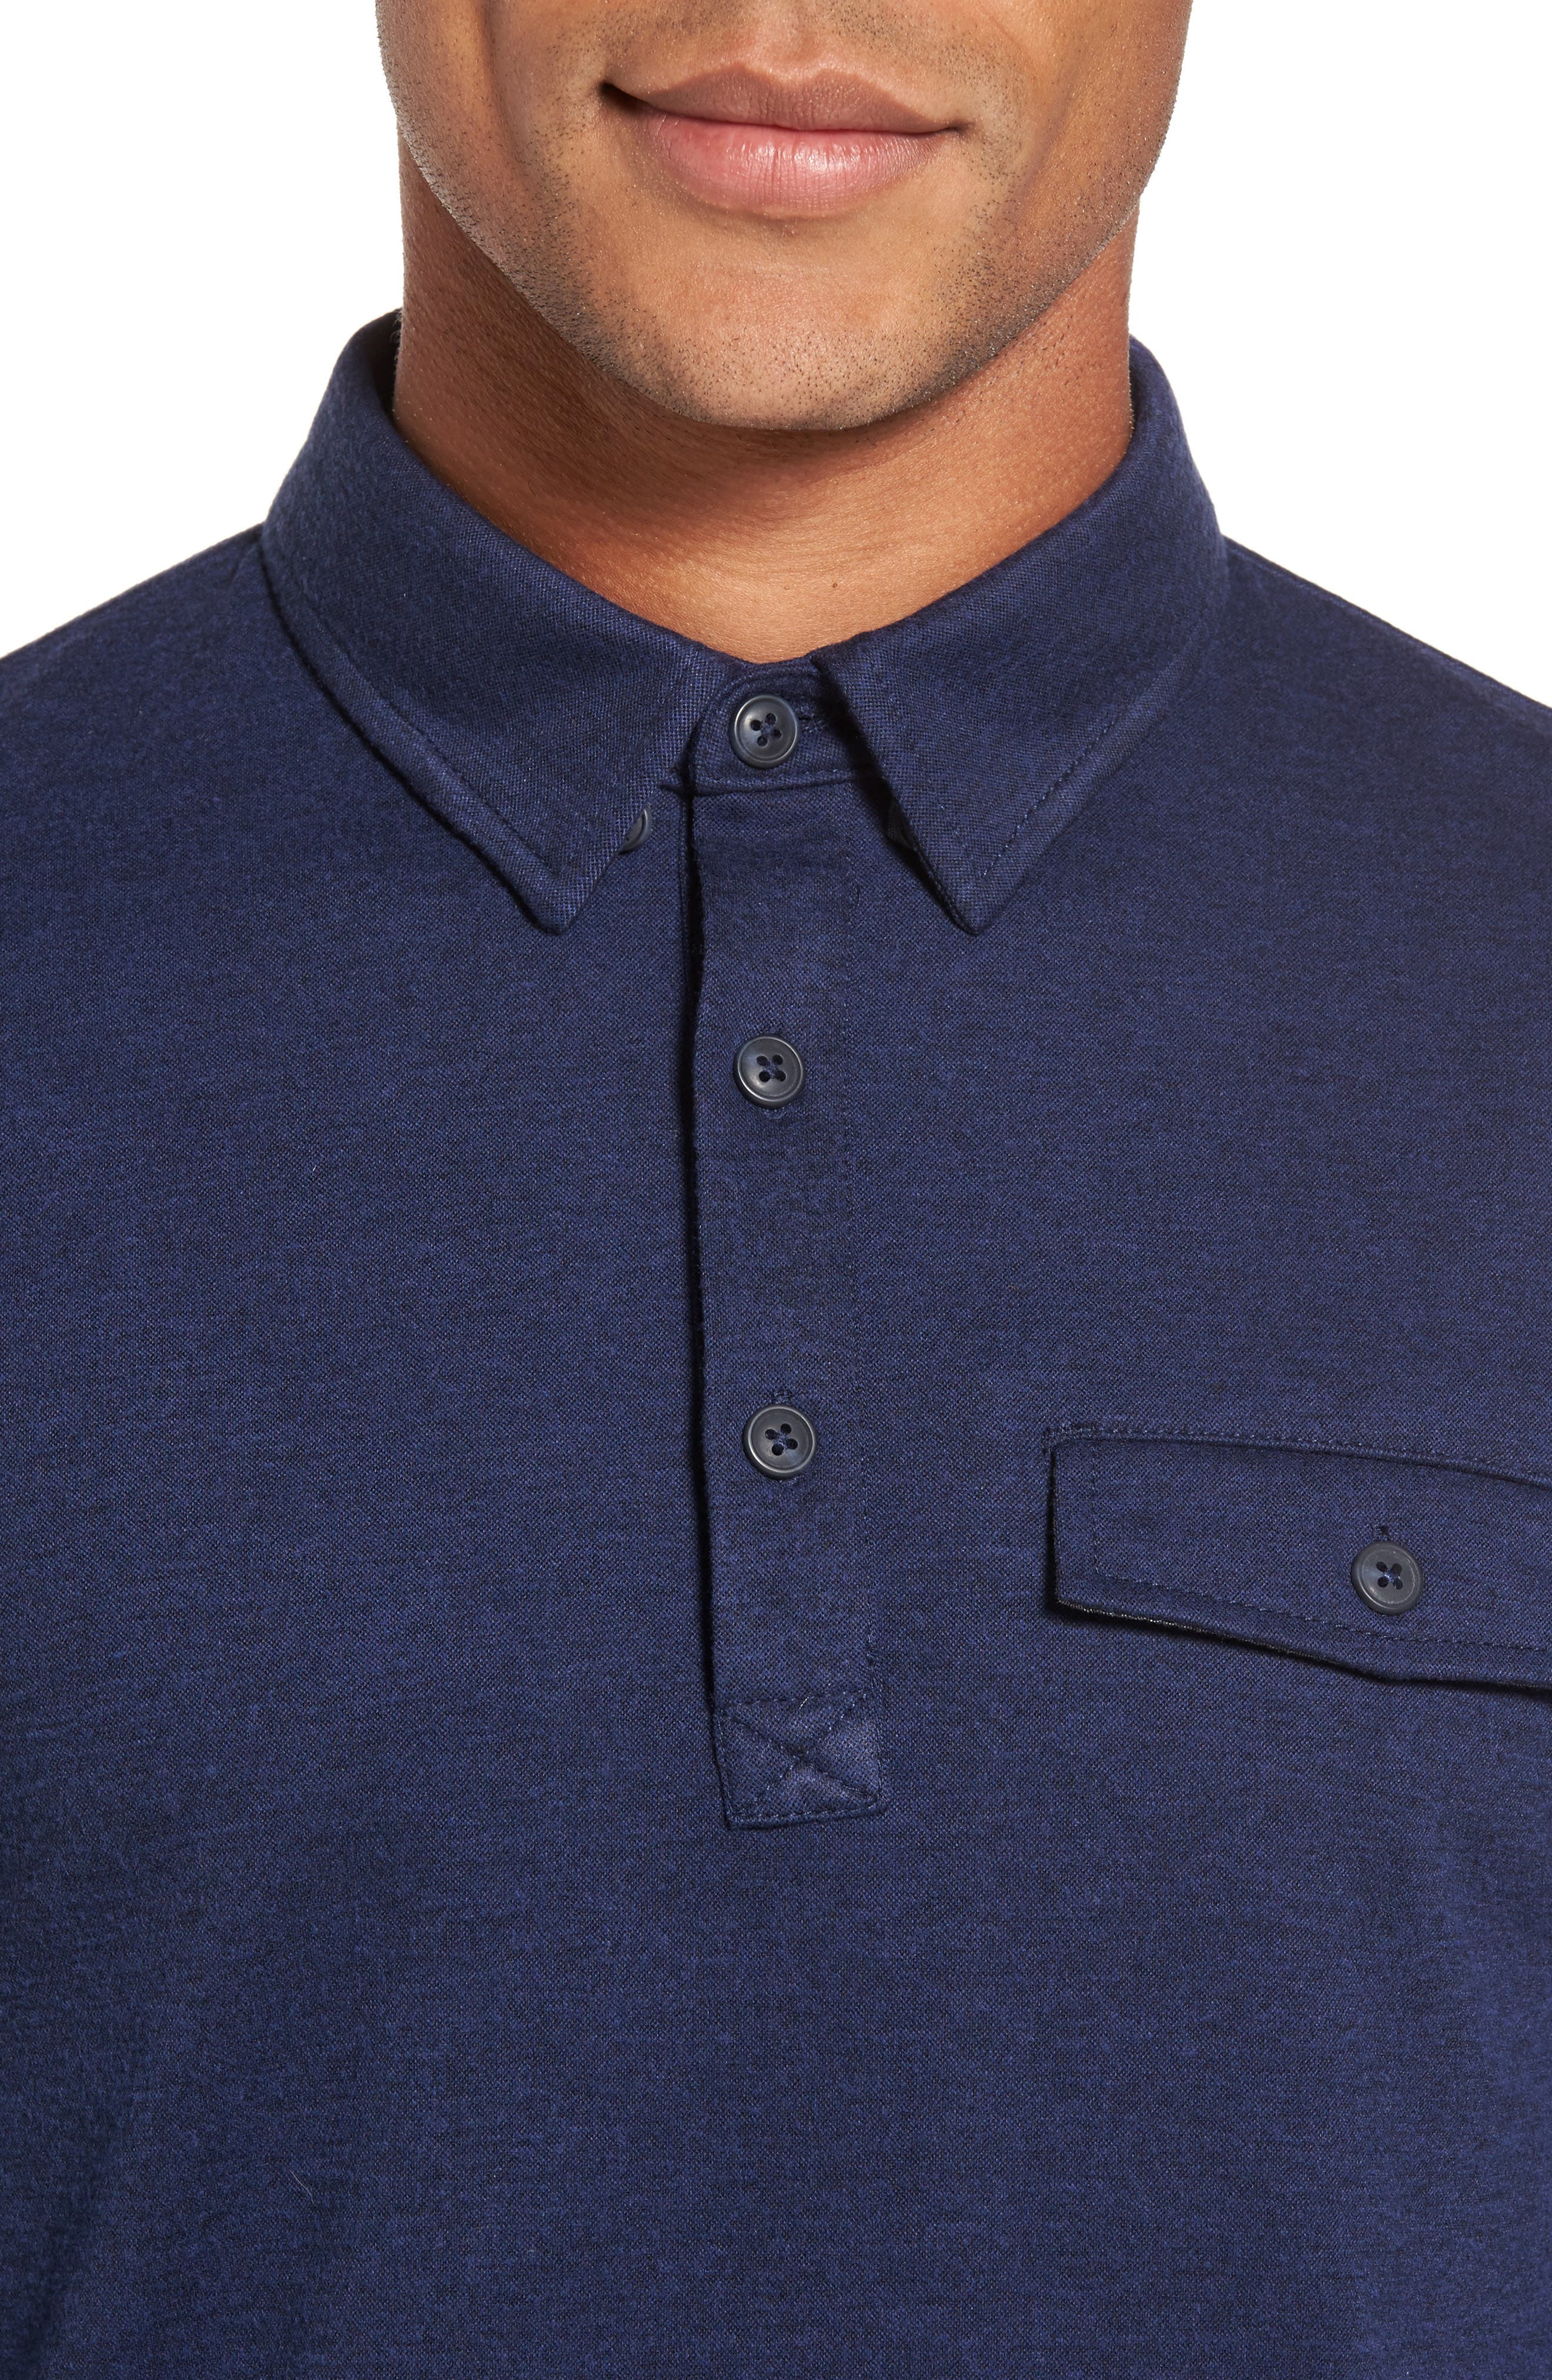 Long Sleeve Polo,                             Alternate thumbnail 4, color,                             Navy